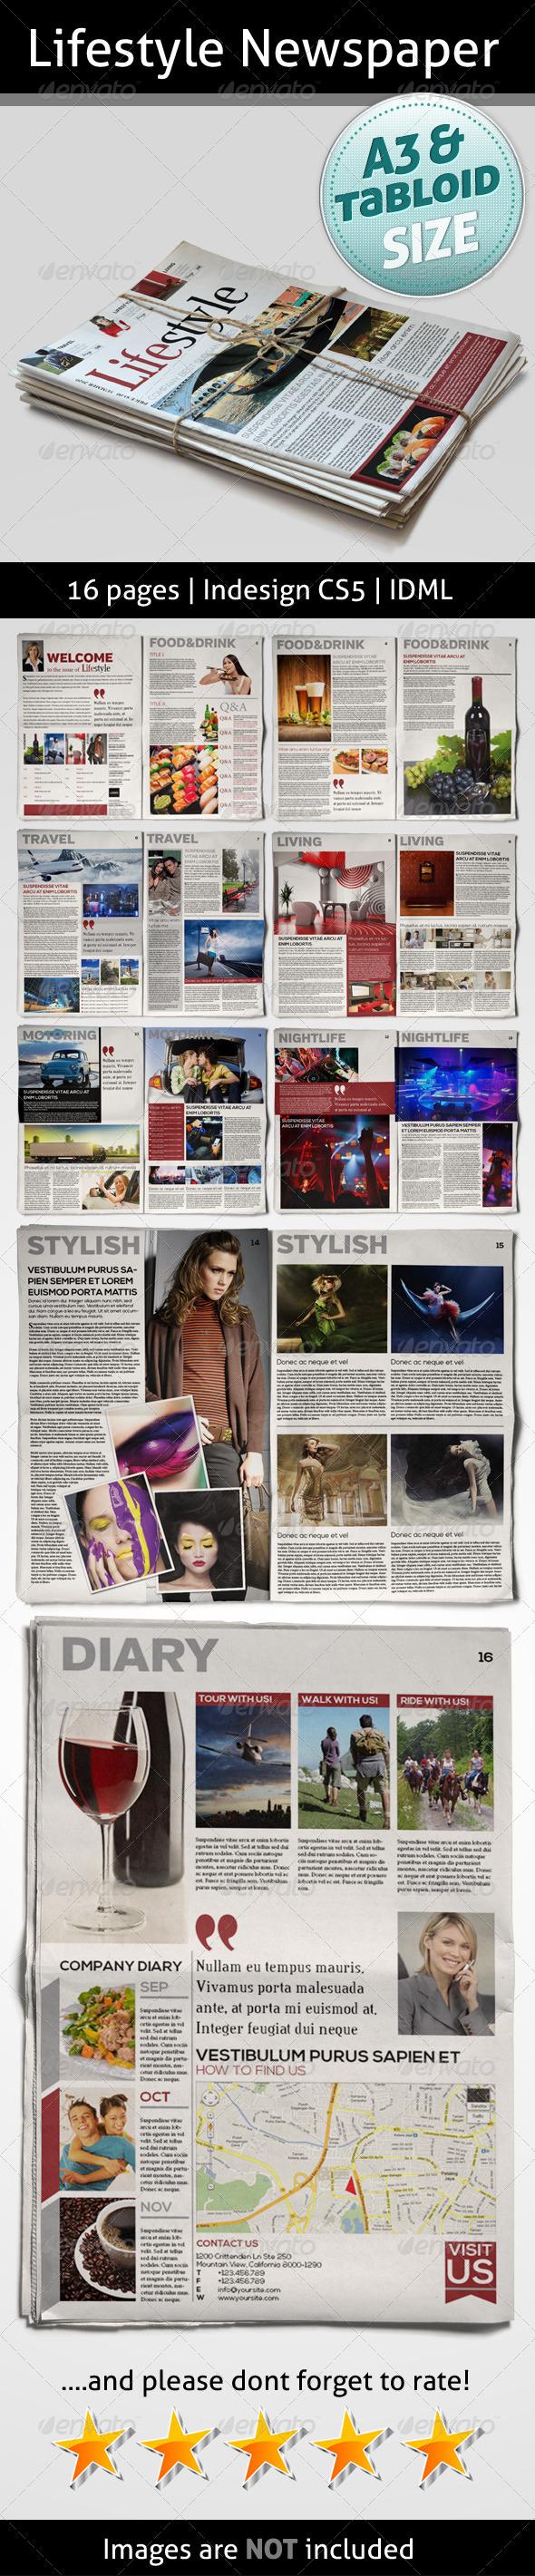 Lifestyle Newspaper - Print Templates